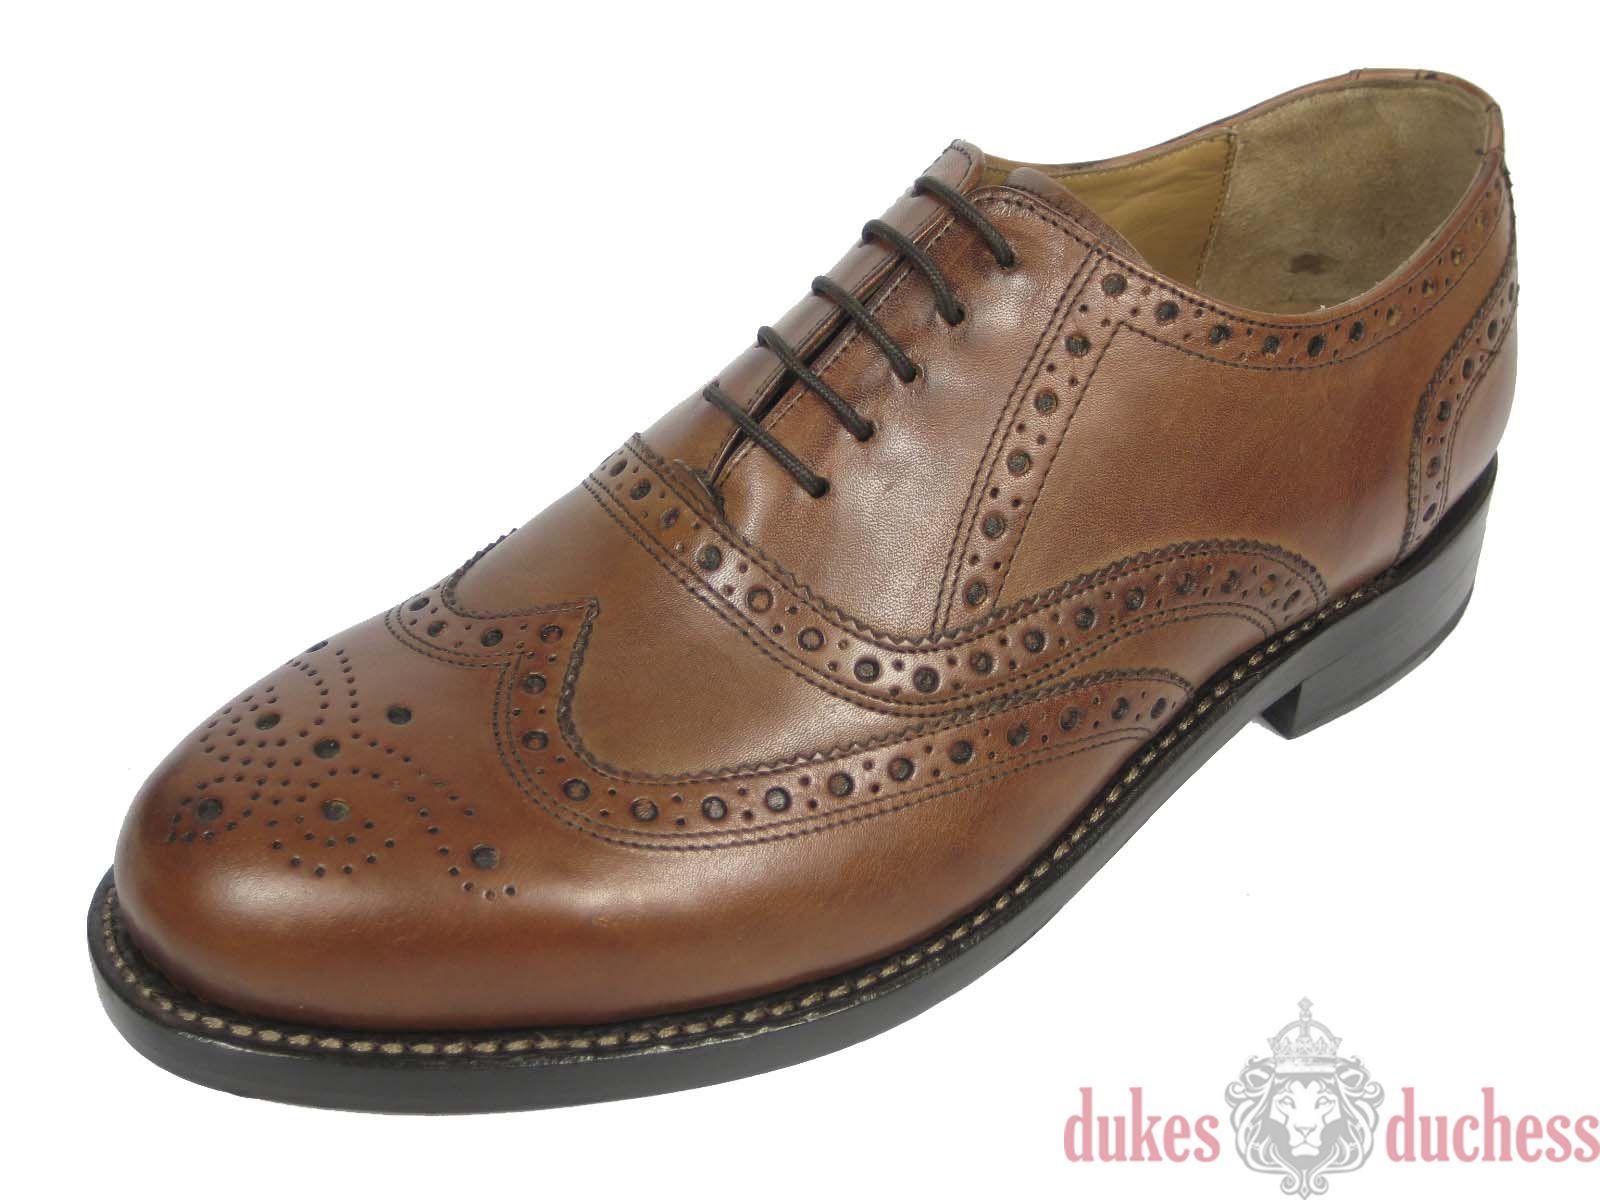 J Briggs Rahmengenahte Leder Schuhe Budapester Fullbrogue Oxford